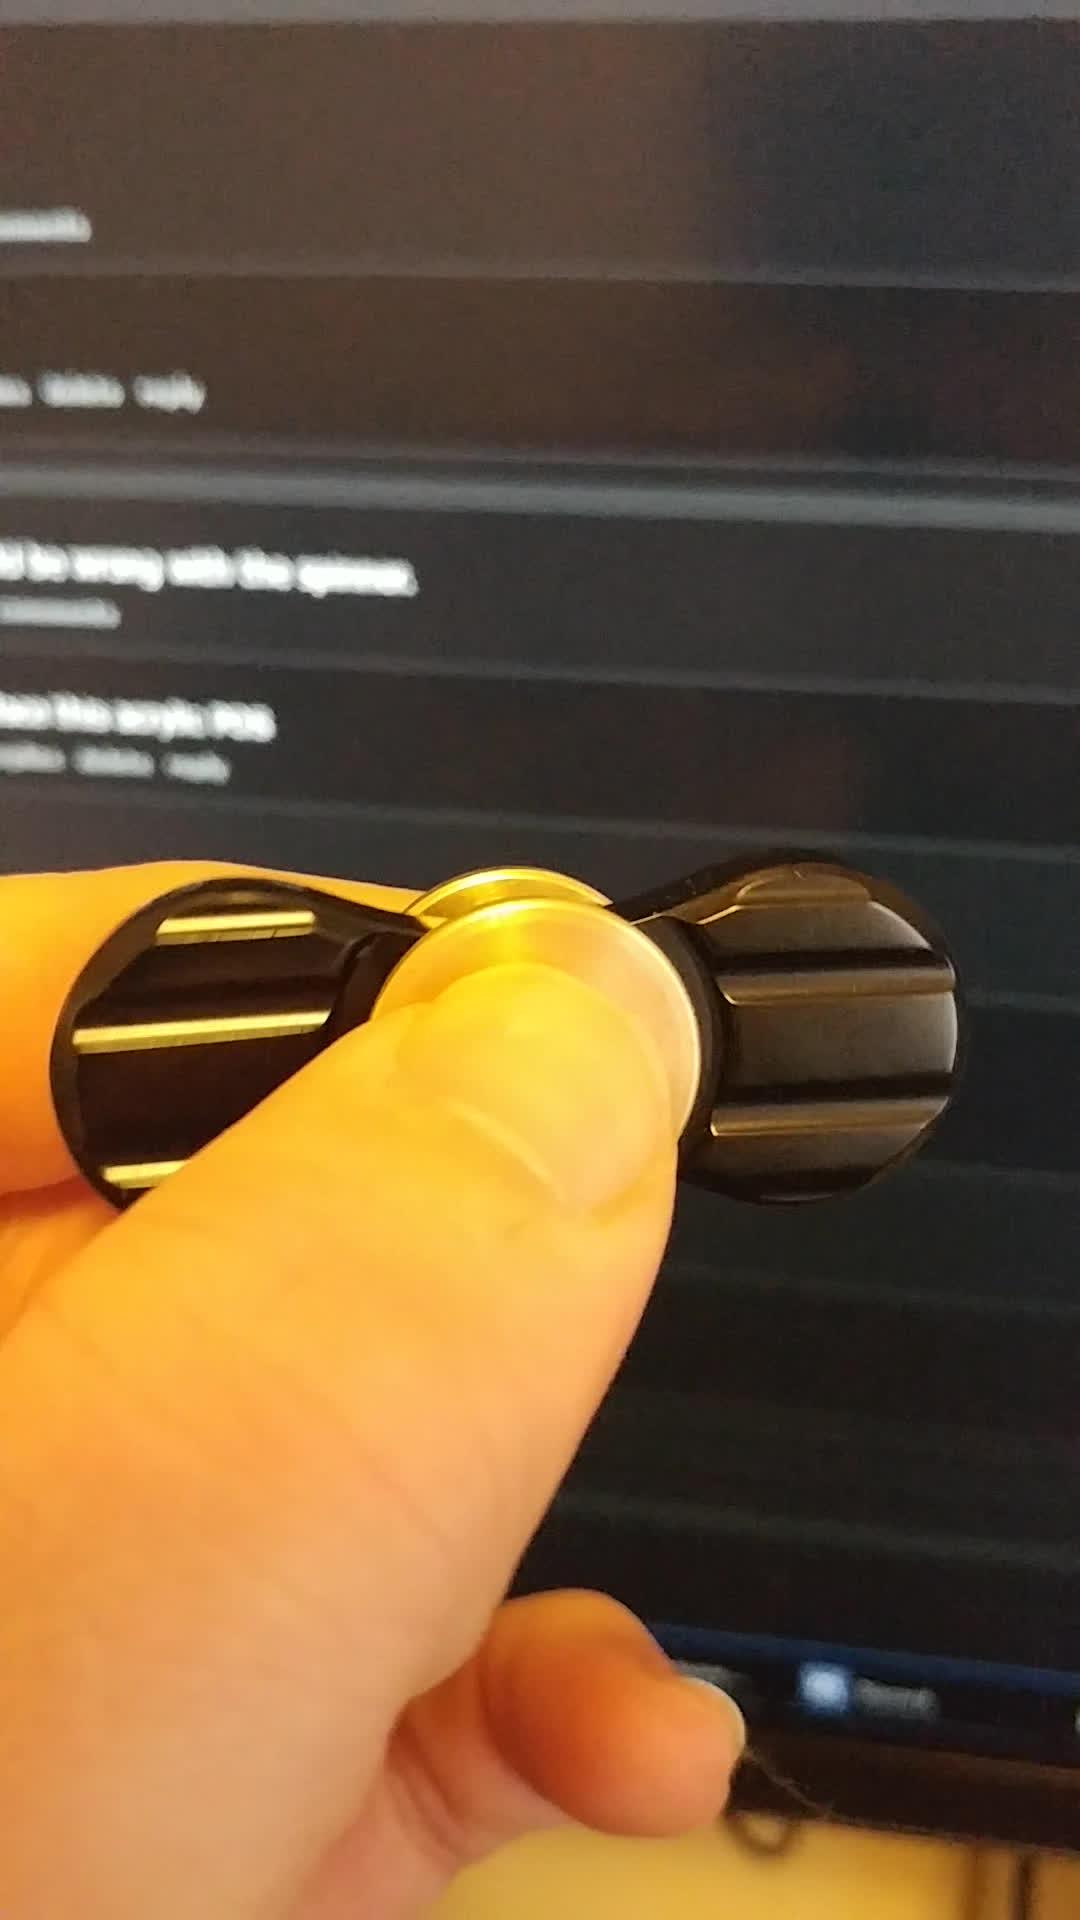 FidgetSpinners, TI-EDC GIFs